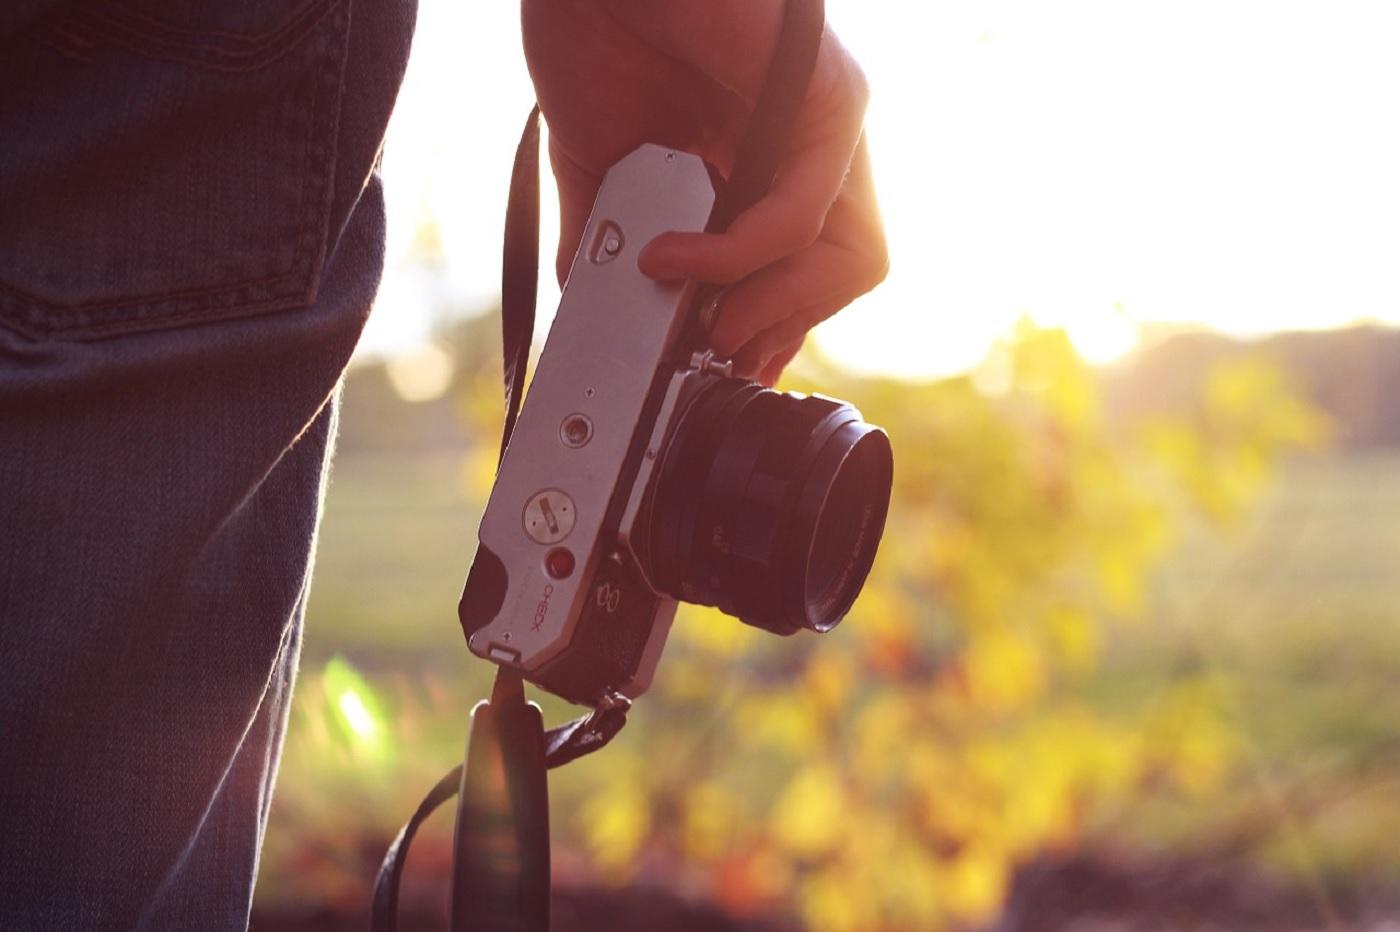 Une caméra, appareil photo, photographie, photographe ( Source Pixabay)